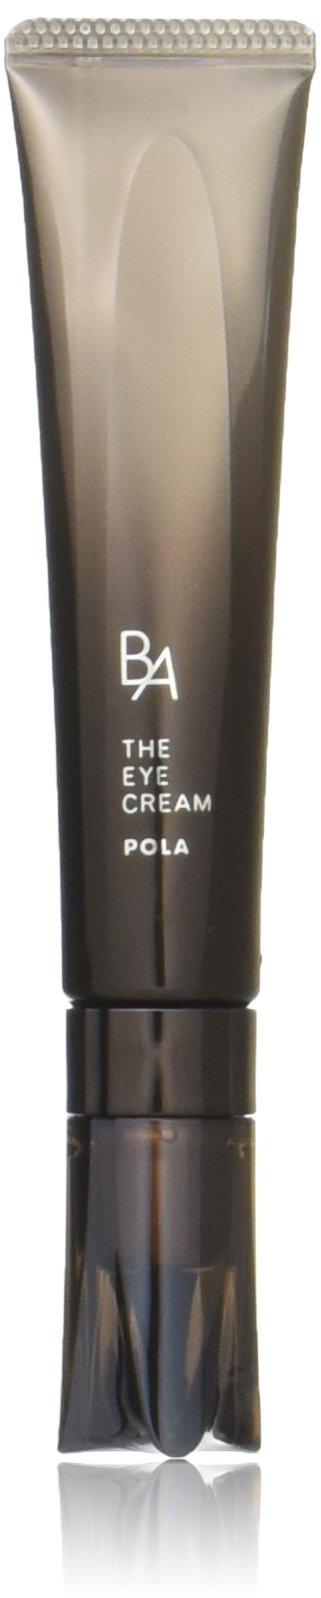 POLA B.A THE EYE CREAM 18g --NEW-- From JAPAN